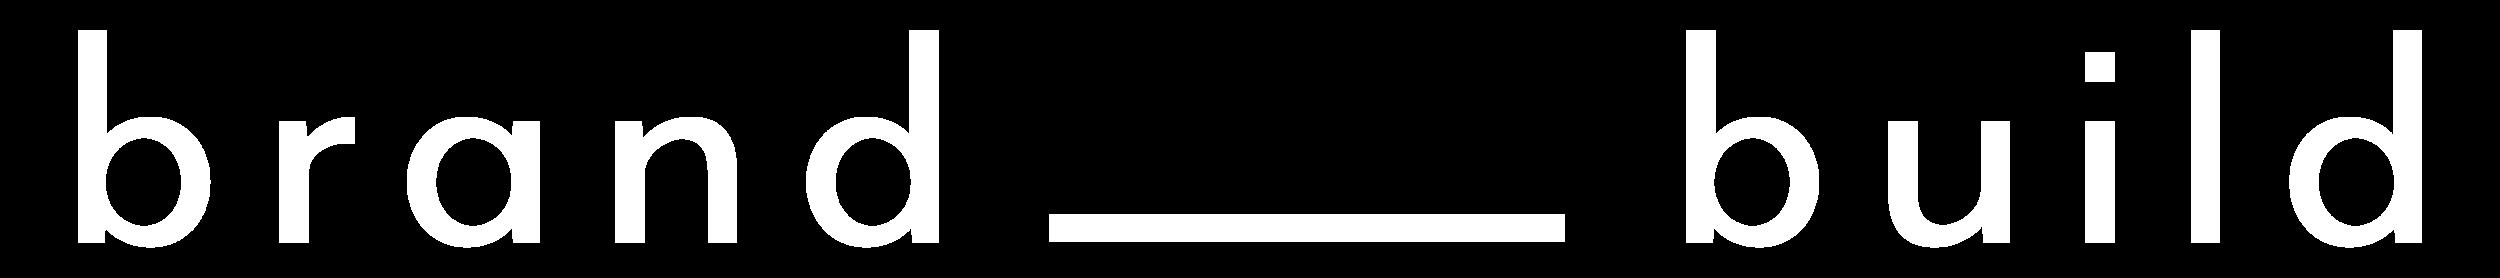 Brand_Build-logo-03 white.png